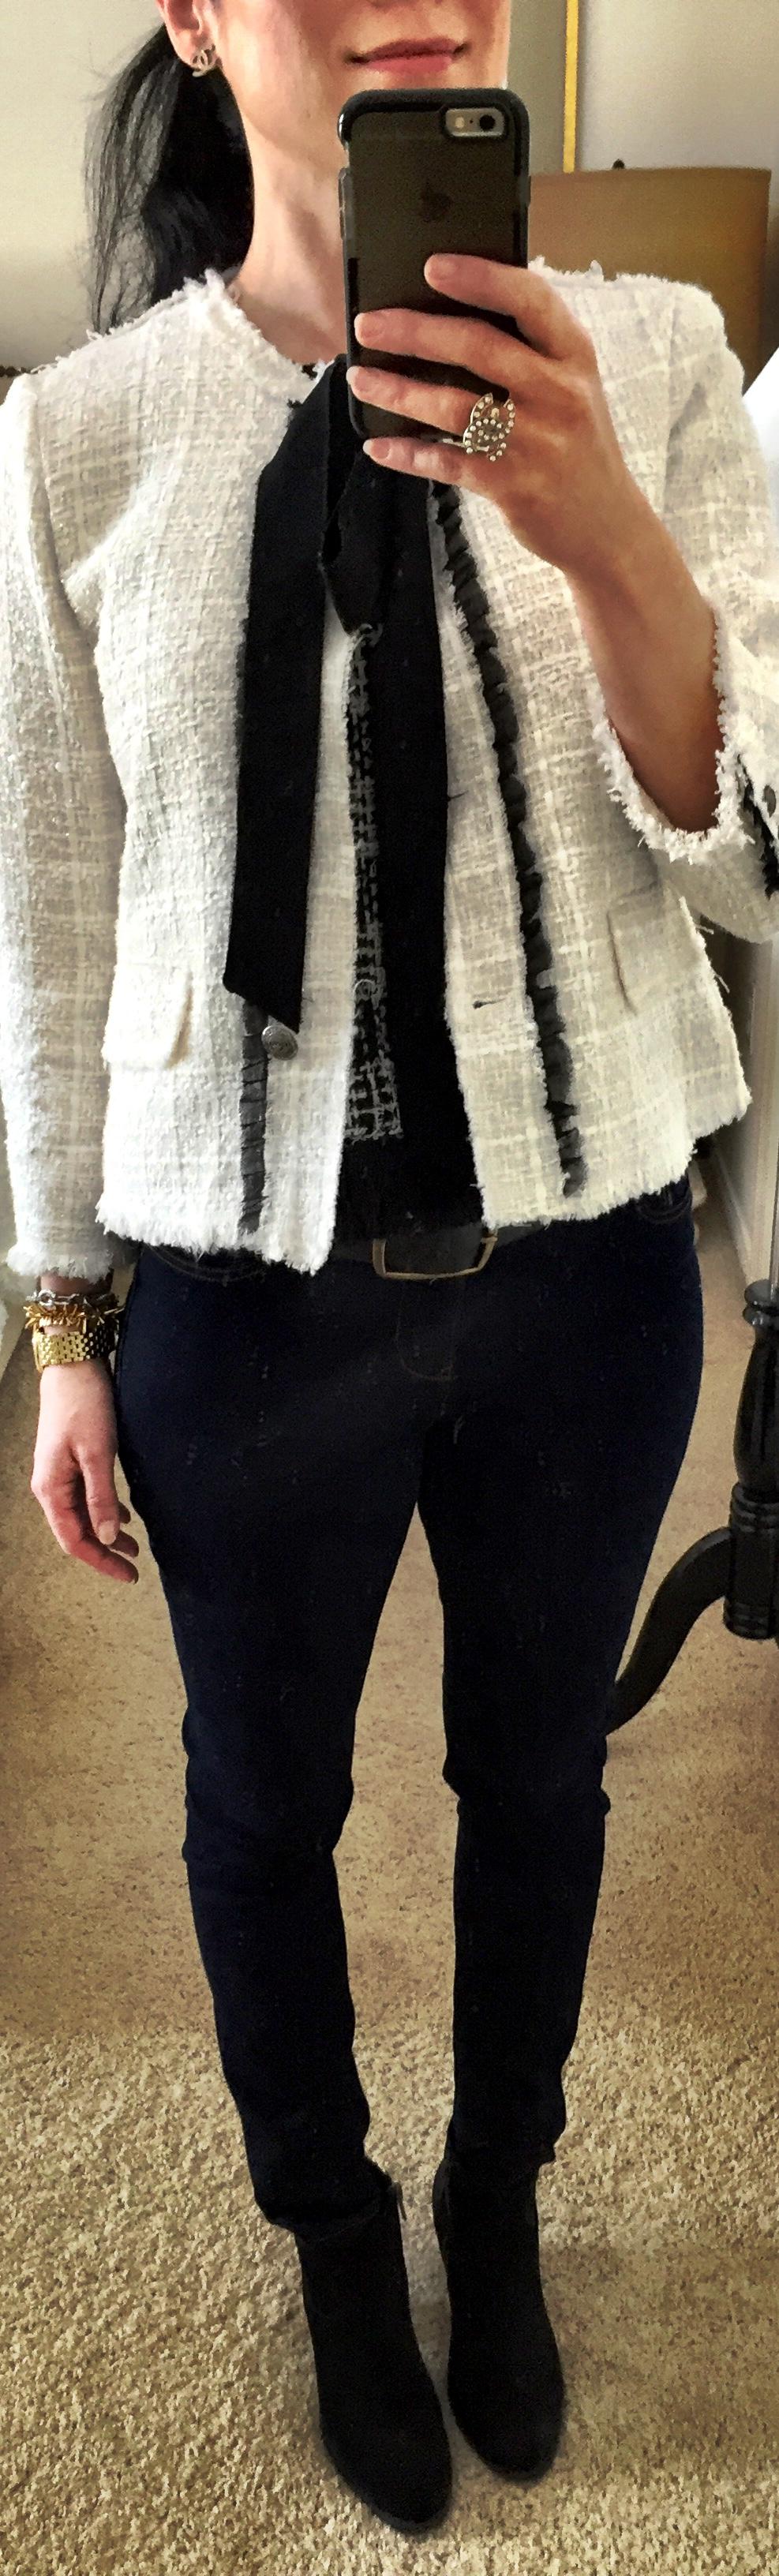 March 4th Zara woven Jacket inspired by Chanel with dark denim